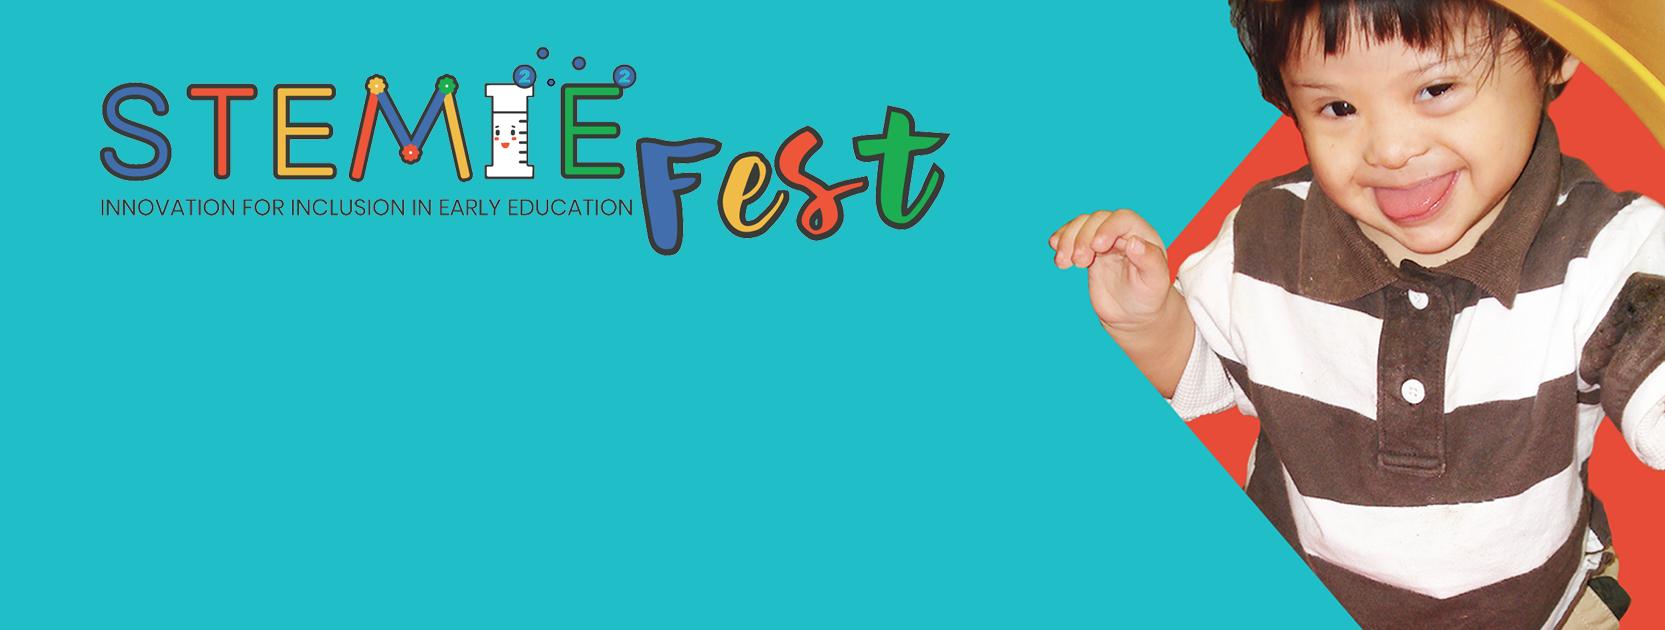 STEMIE Fest